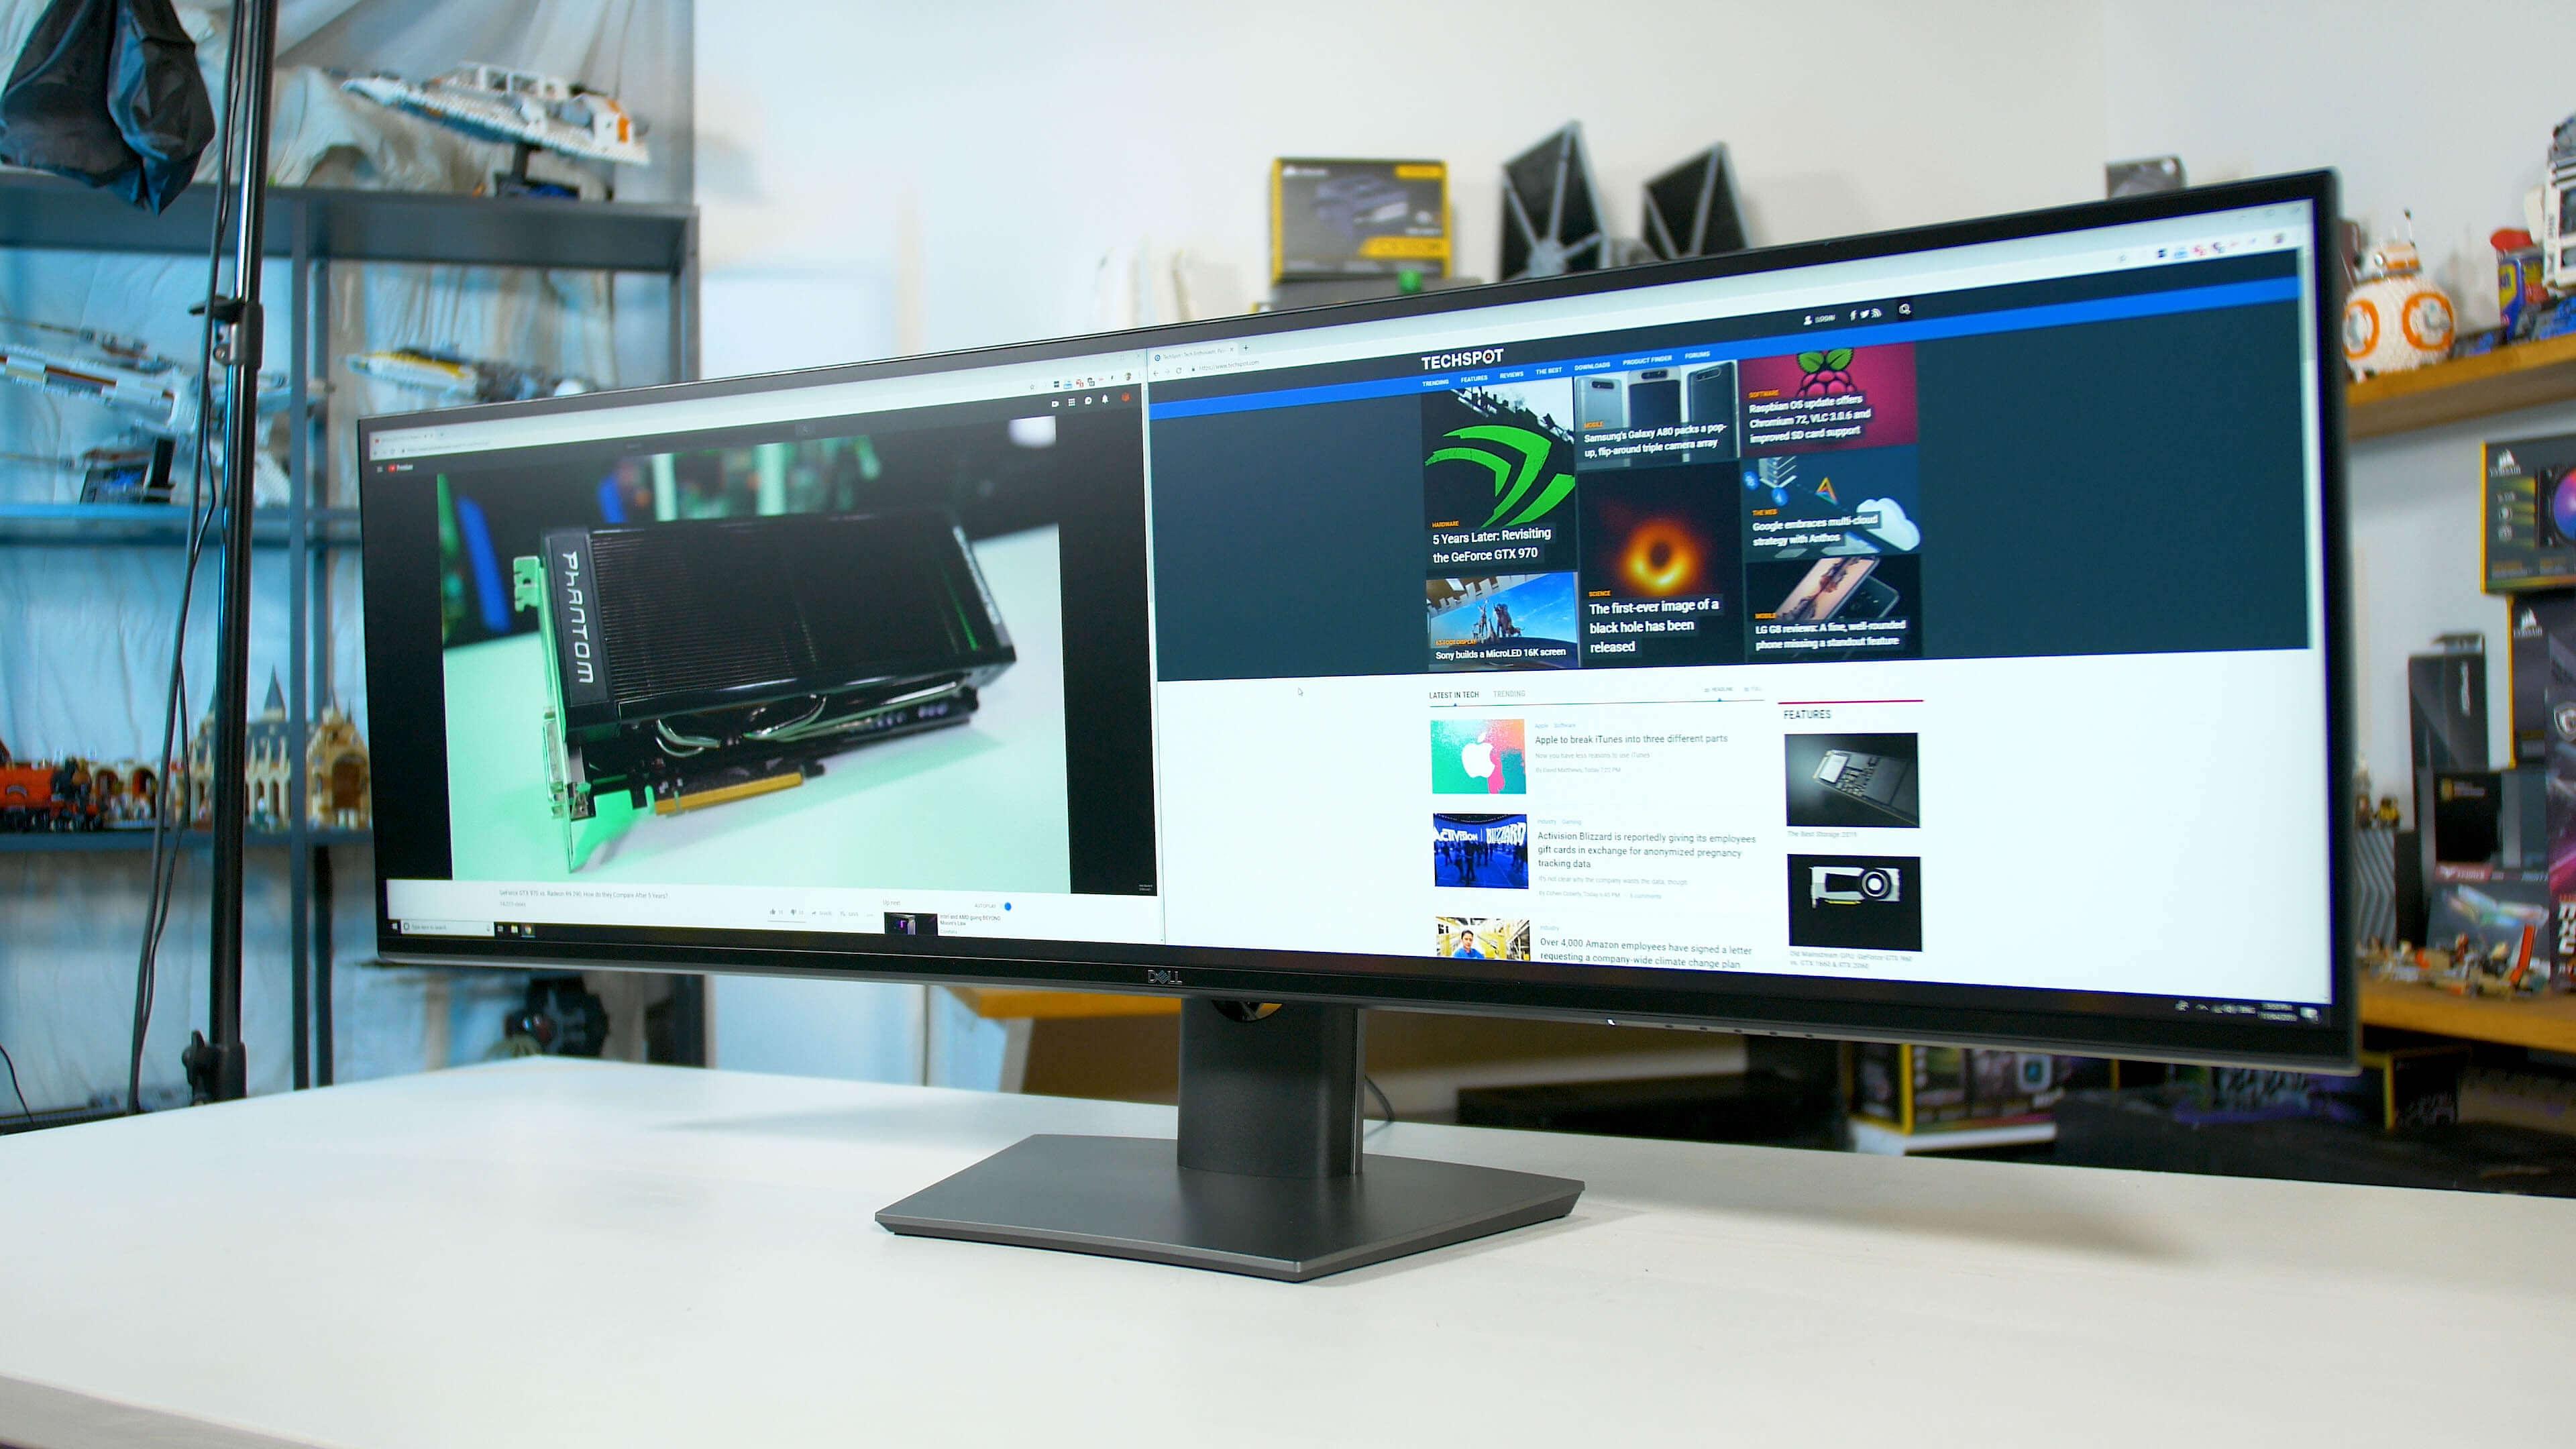 Dell Ultrasharp U4919dw 49 Monitor Review